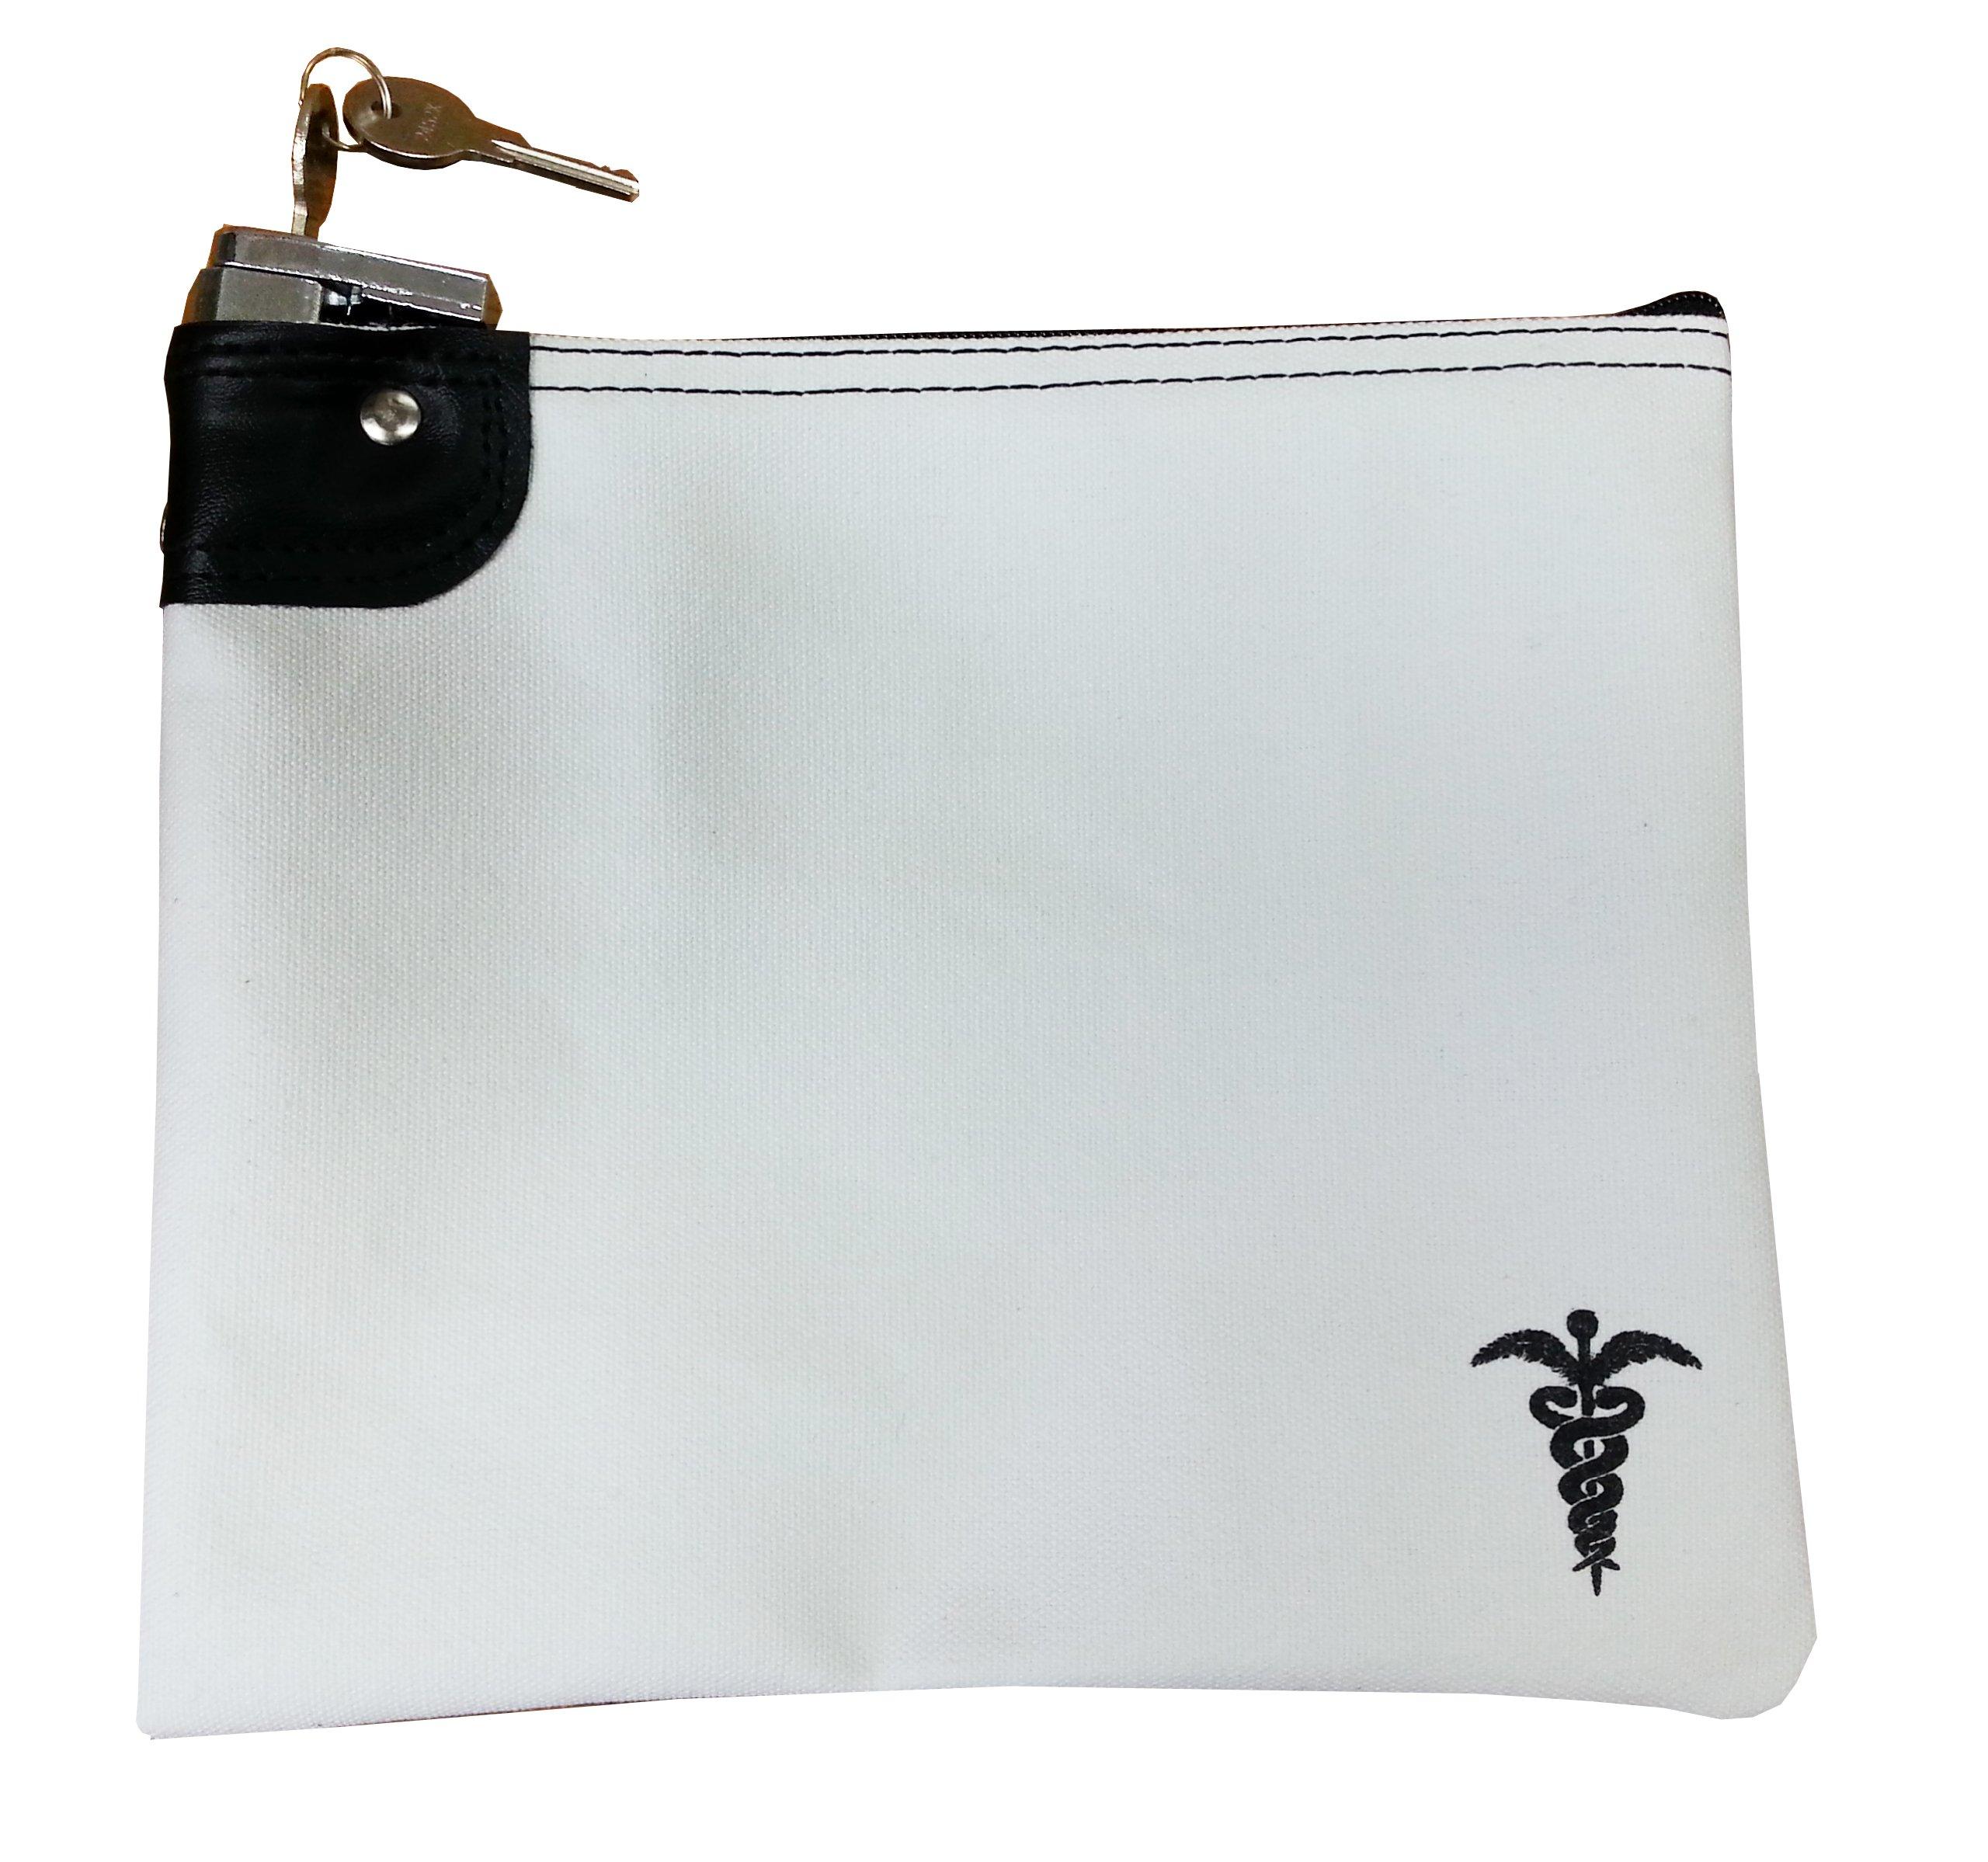 Medication Bag Heavy Canvas Standard Keyed Lock Storage Case White by Cardinal Bag Supplies